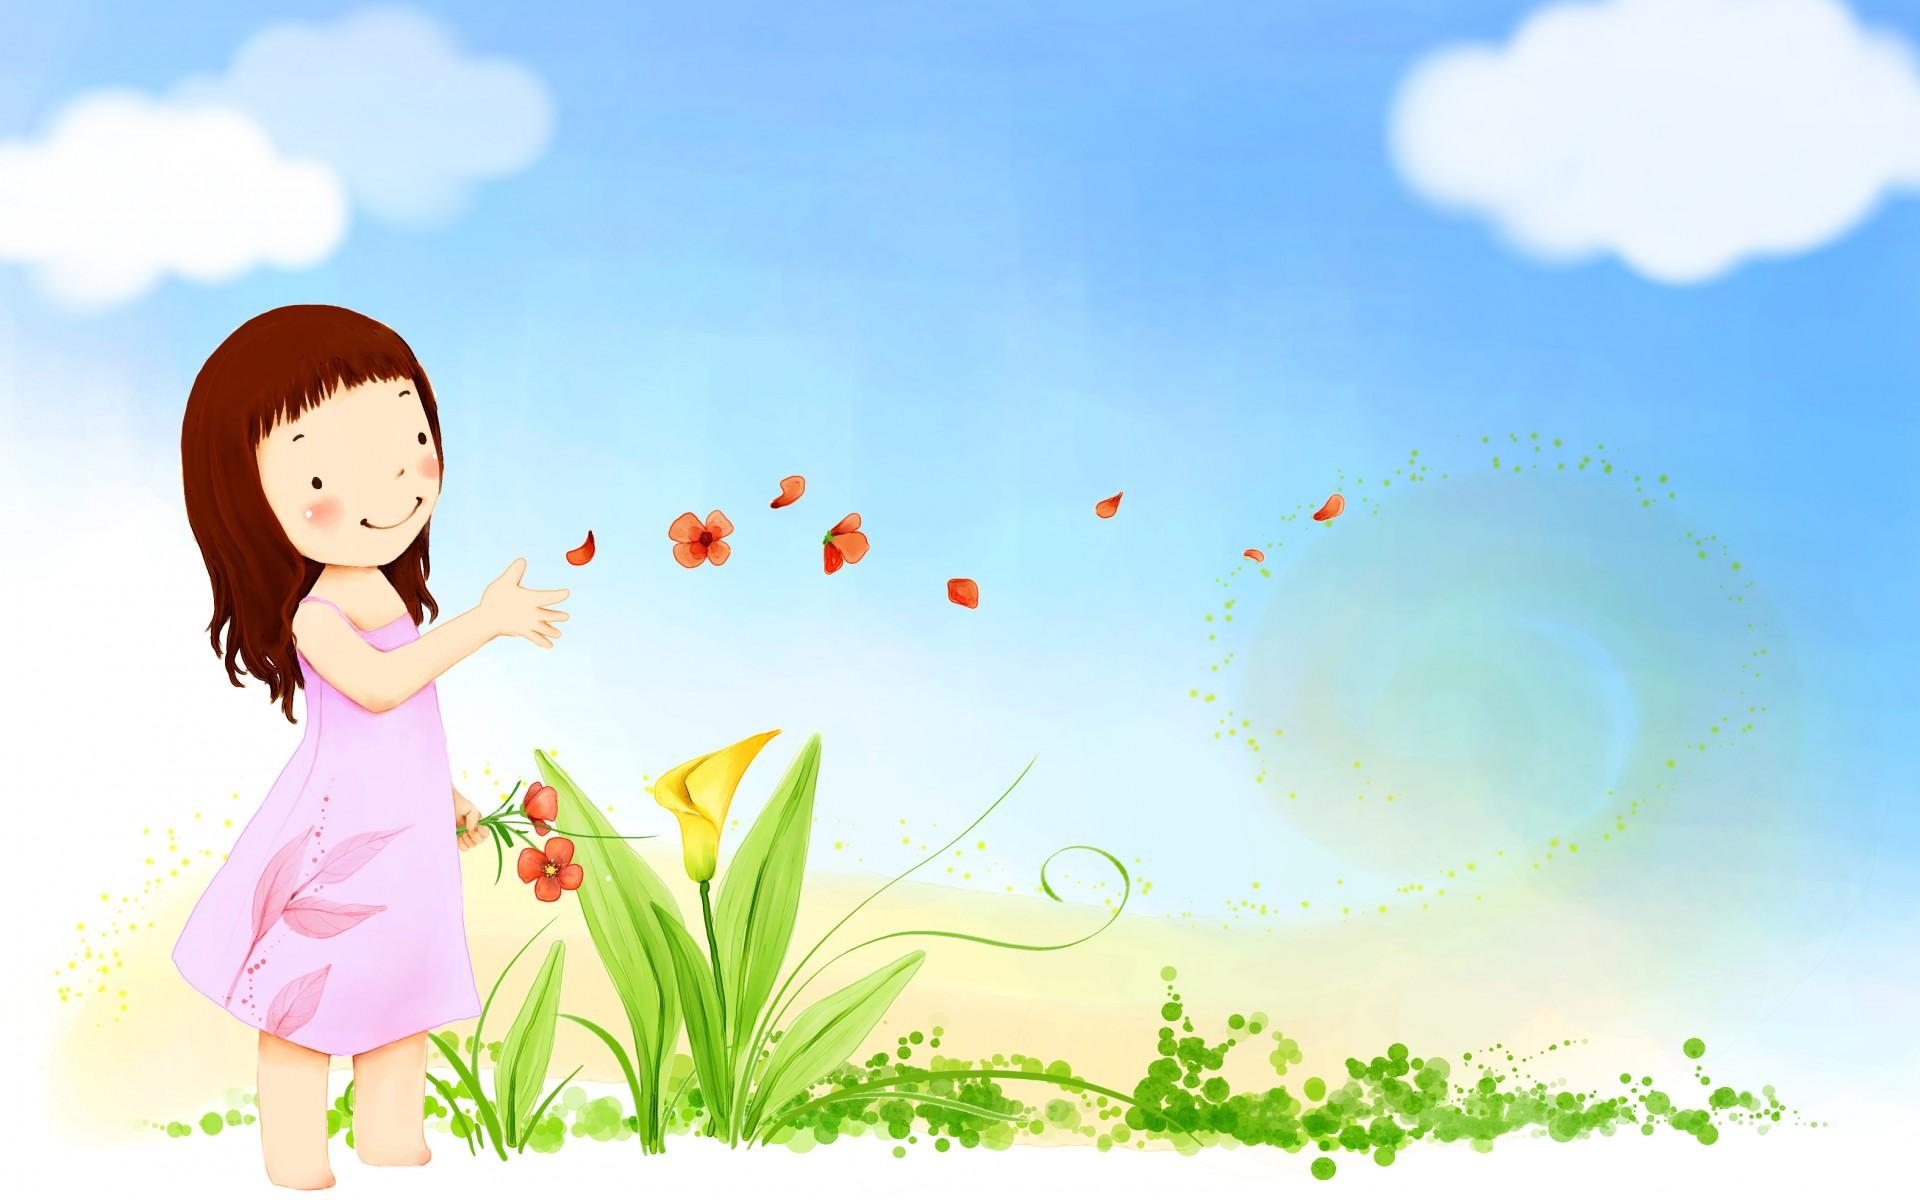 little girl butterfly wallpapers - photo #10